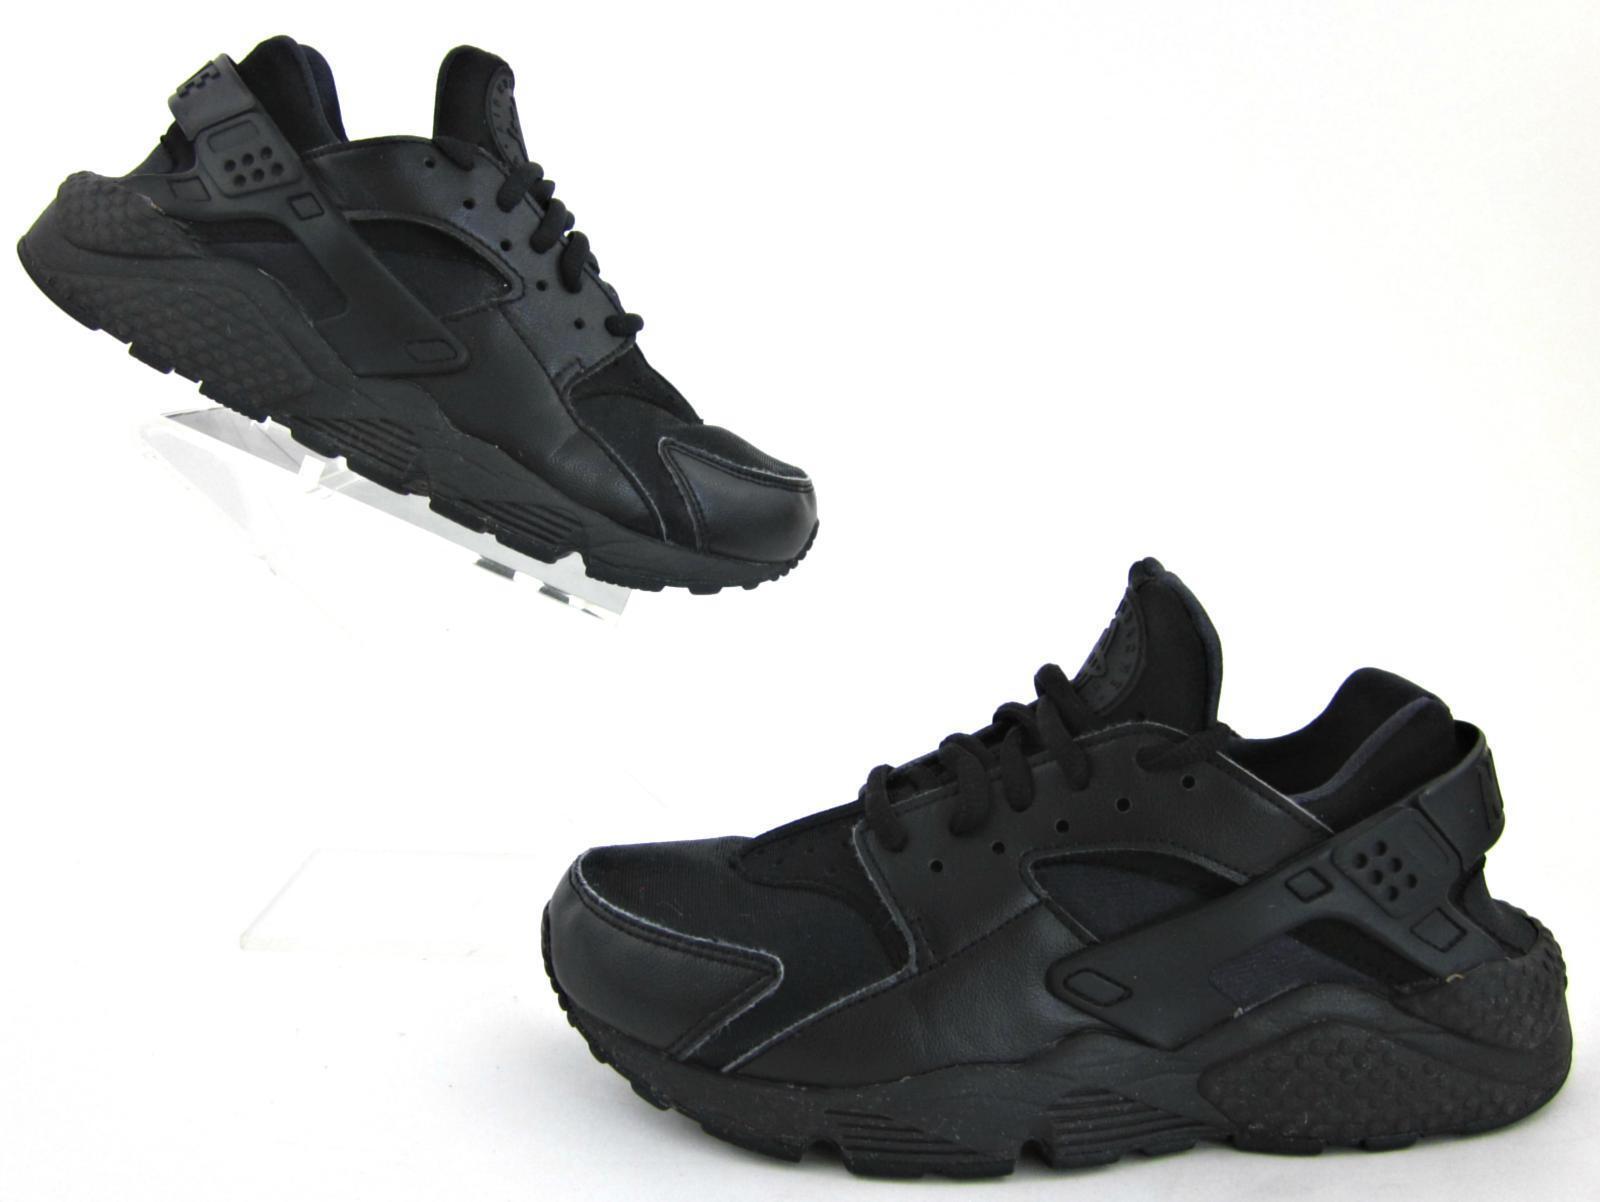 Nike Air Huarache Run Fitness Shoes Black/Black Sz 7.5 Run Small Fit 6-6.5